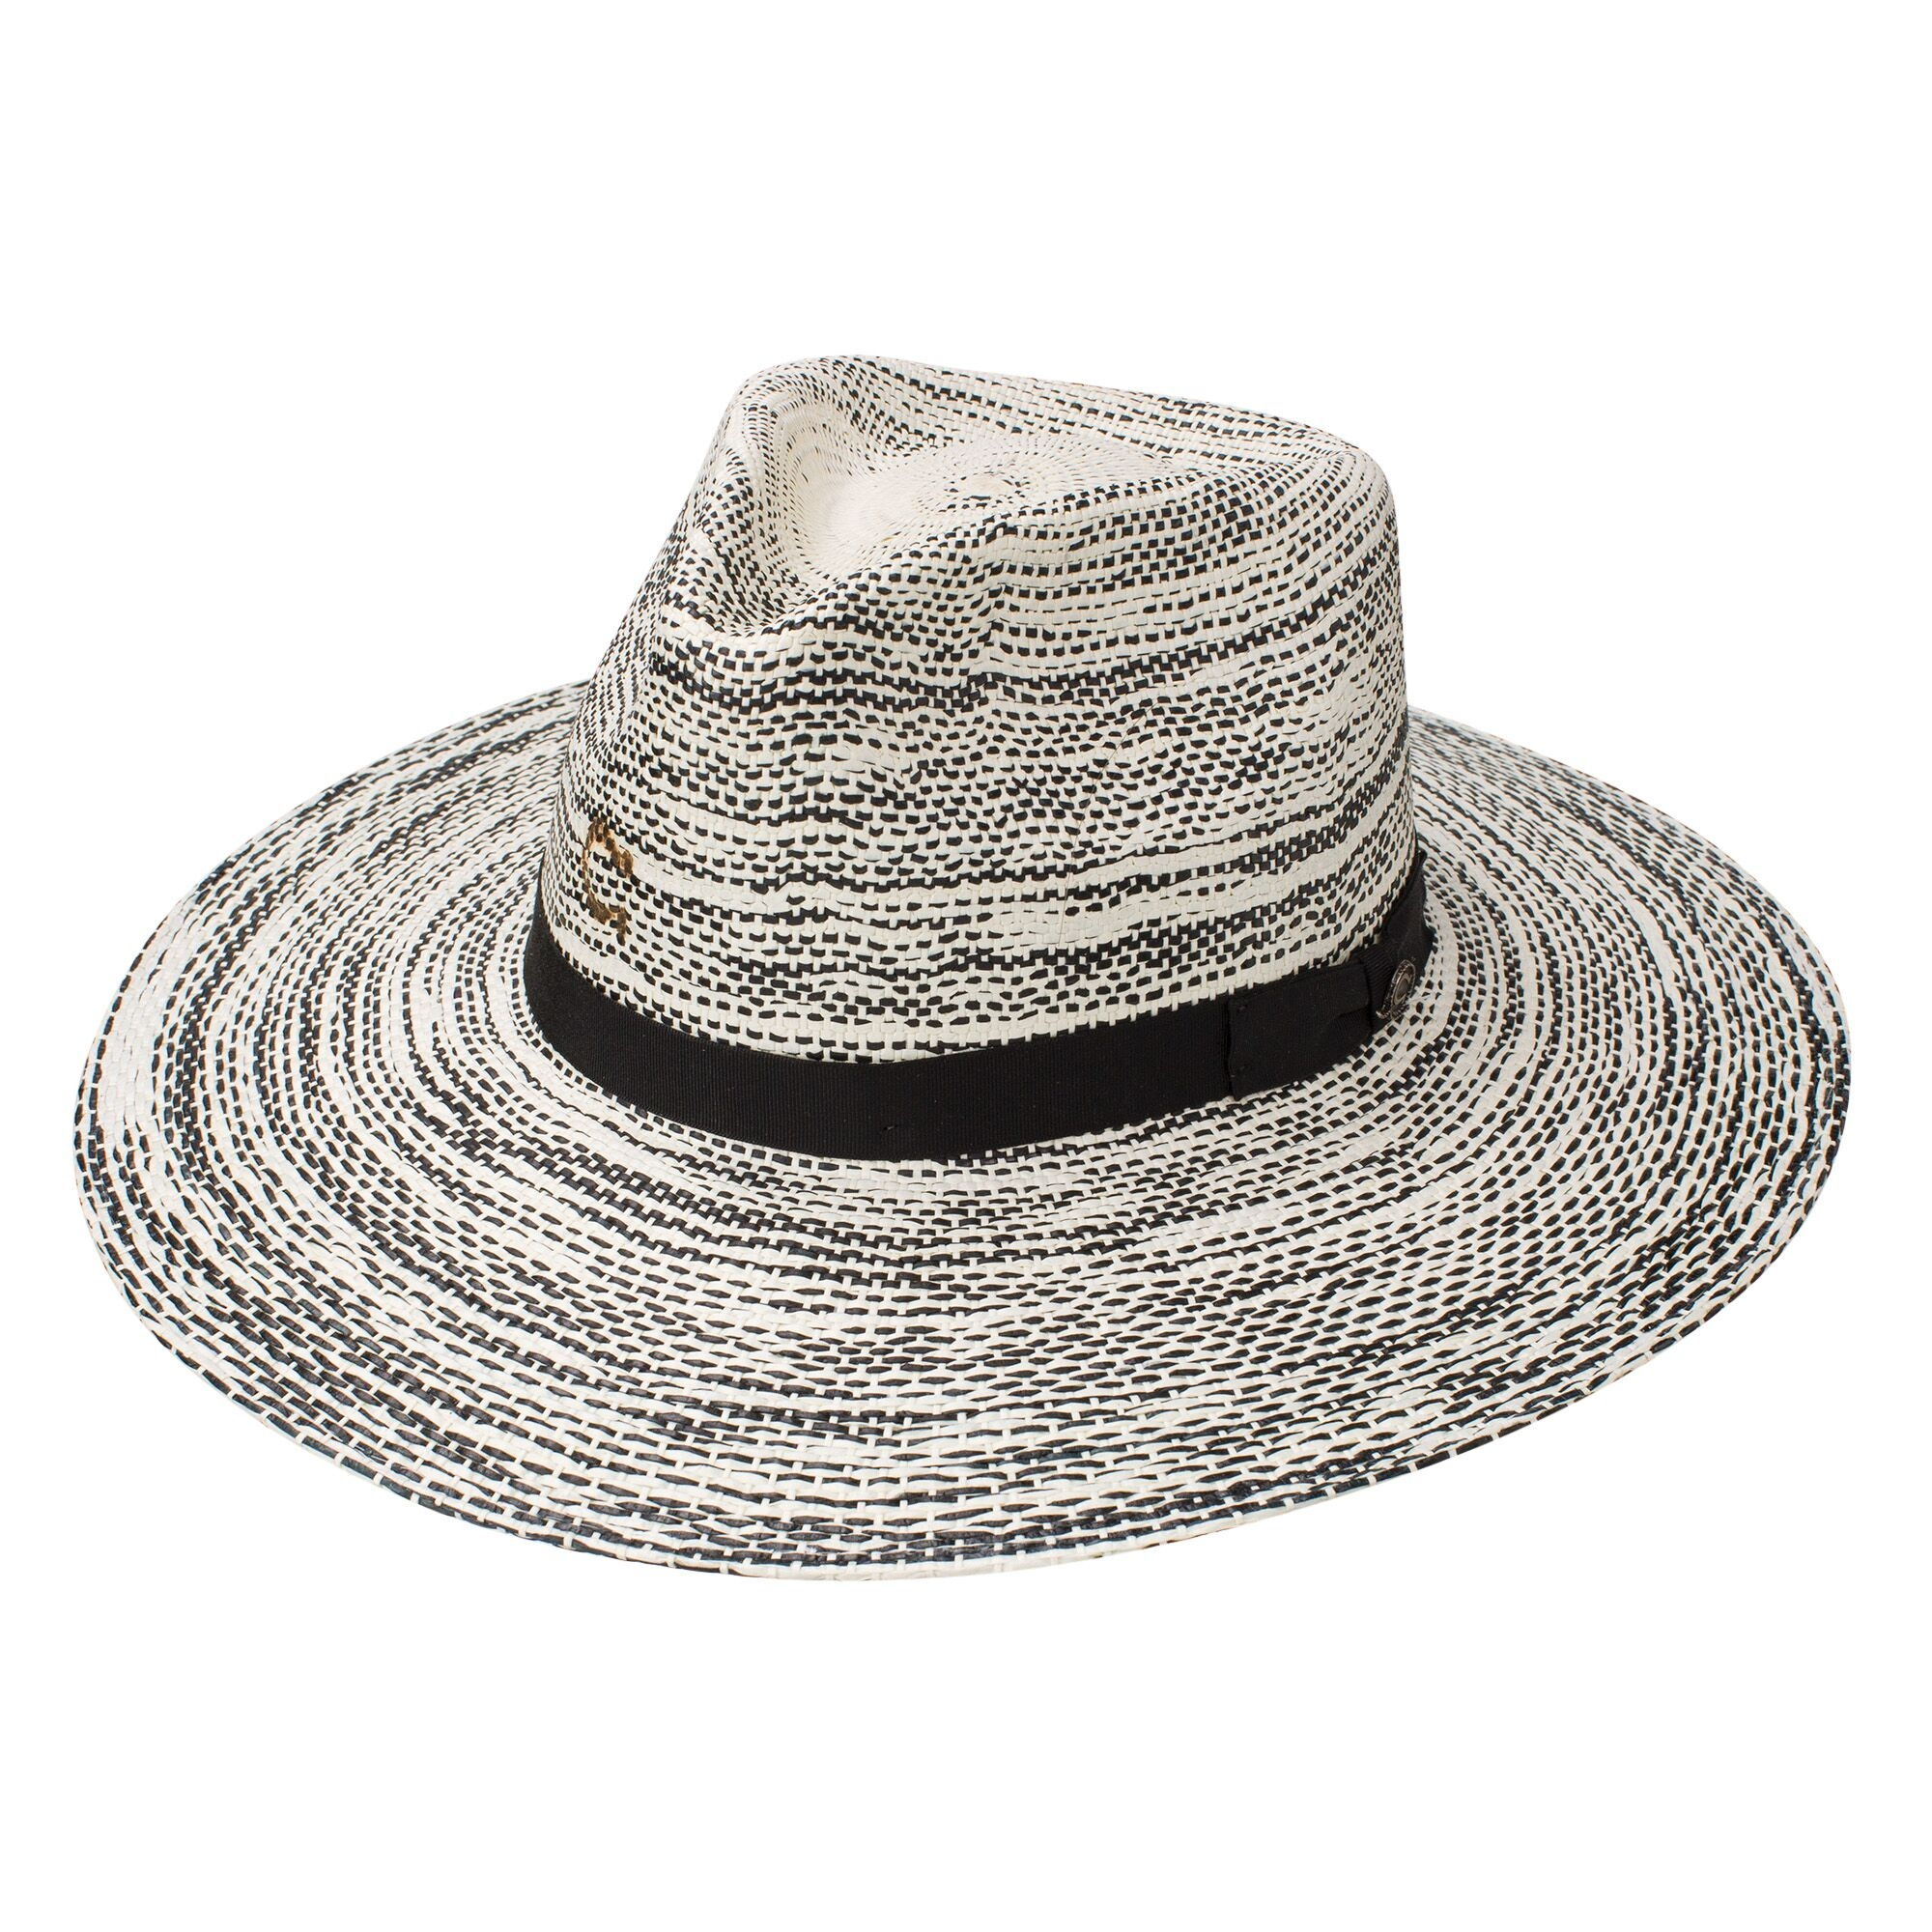 Charlie 1 Horse Hawaii Ya - Straw Cowgirl Hat